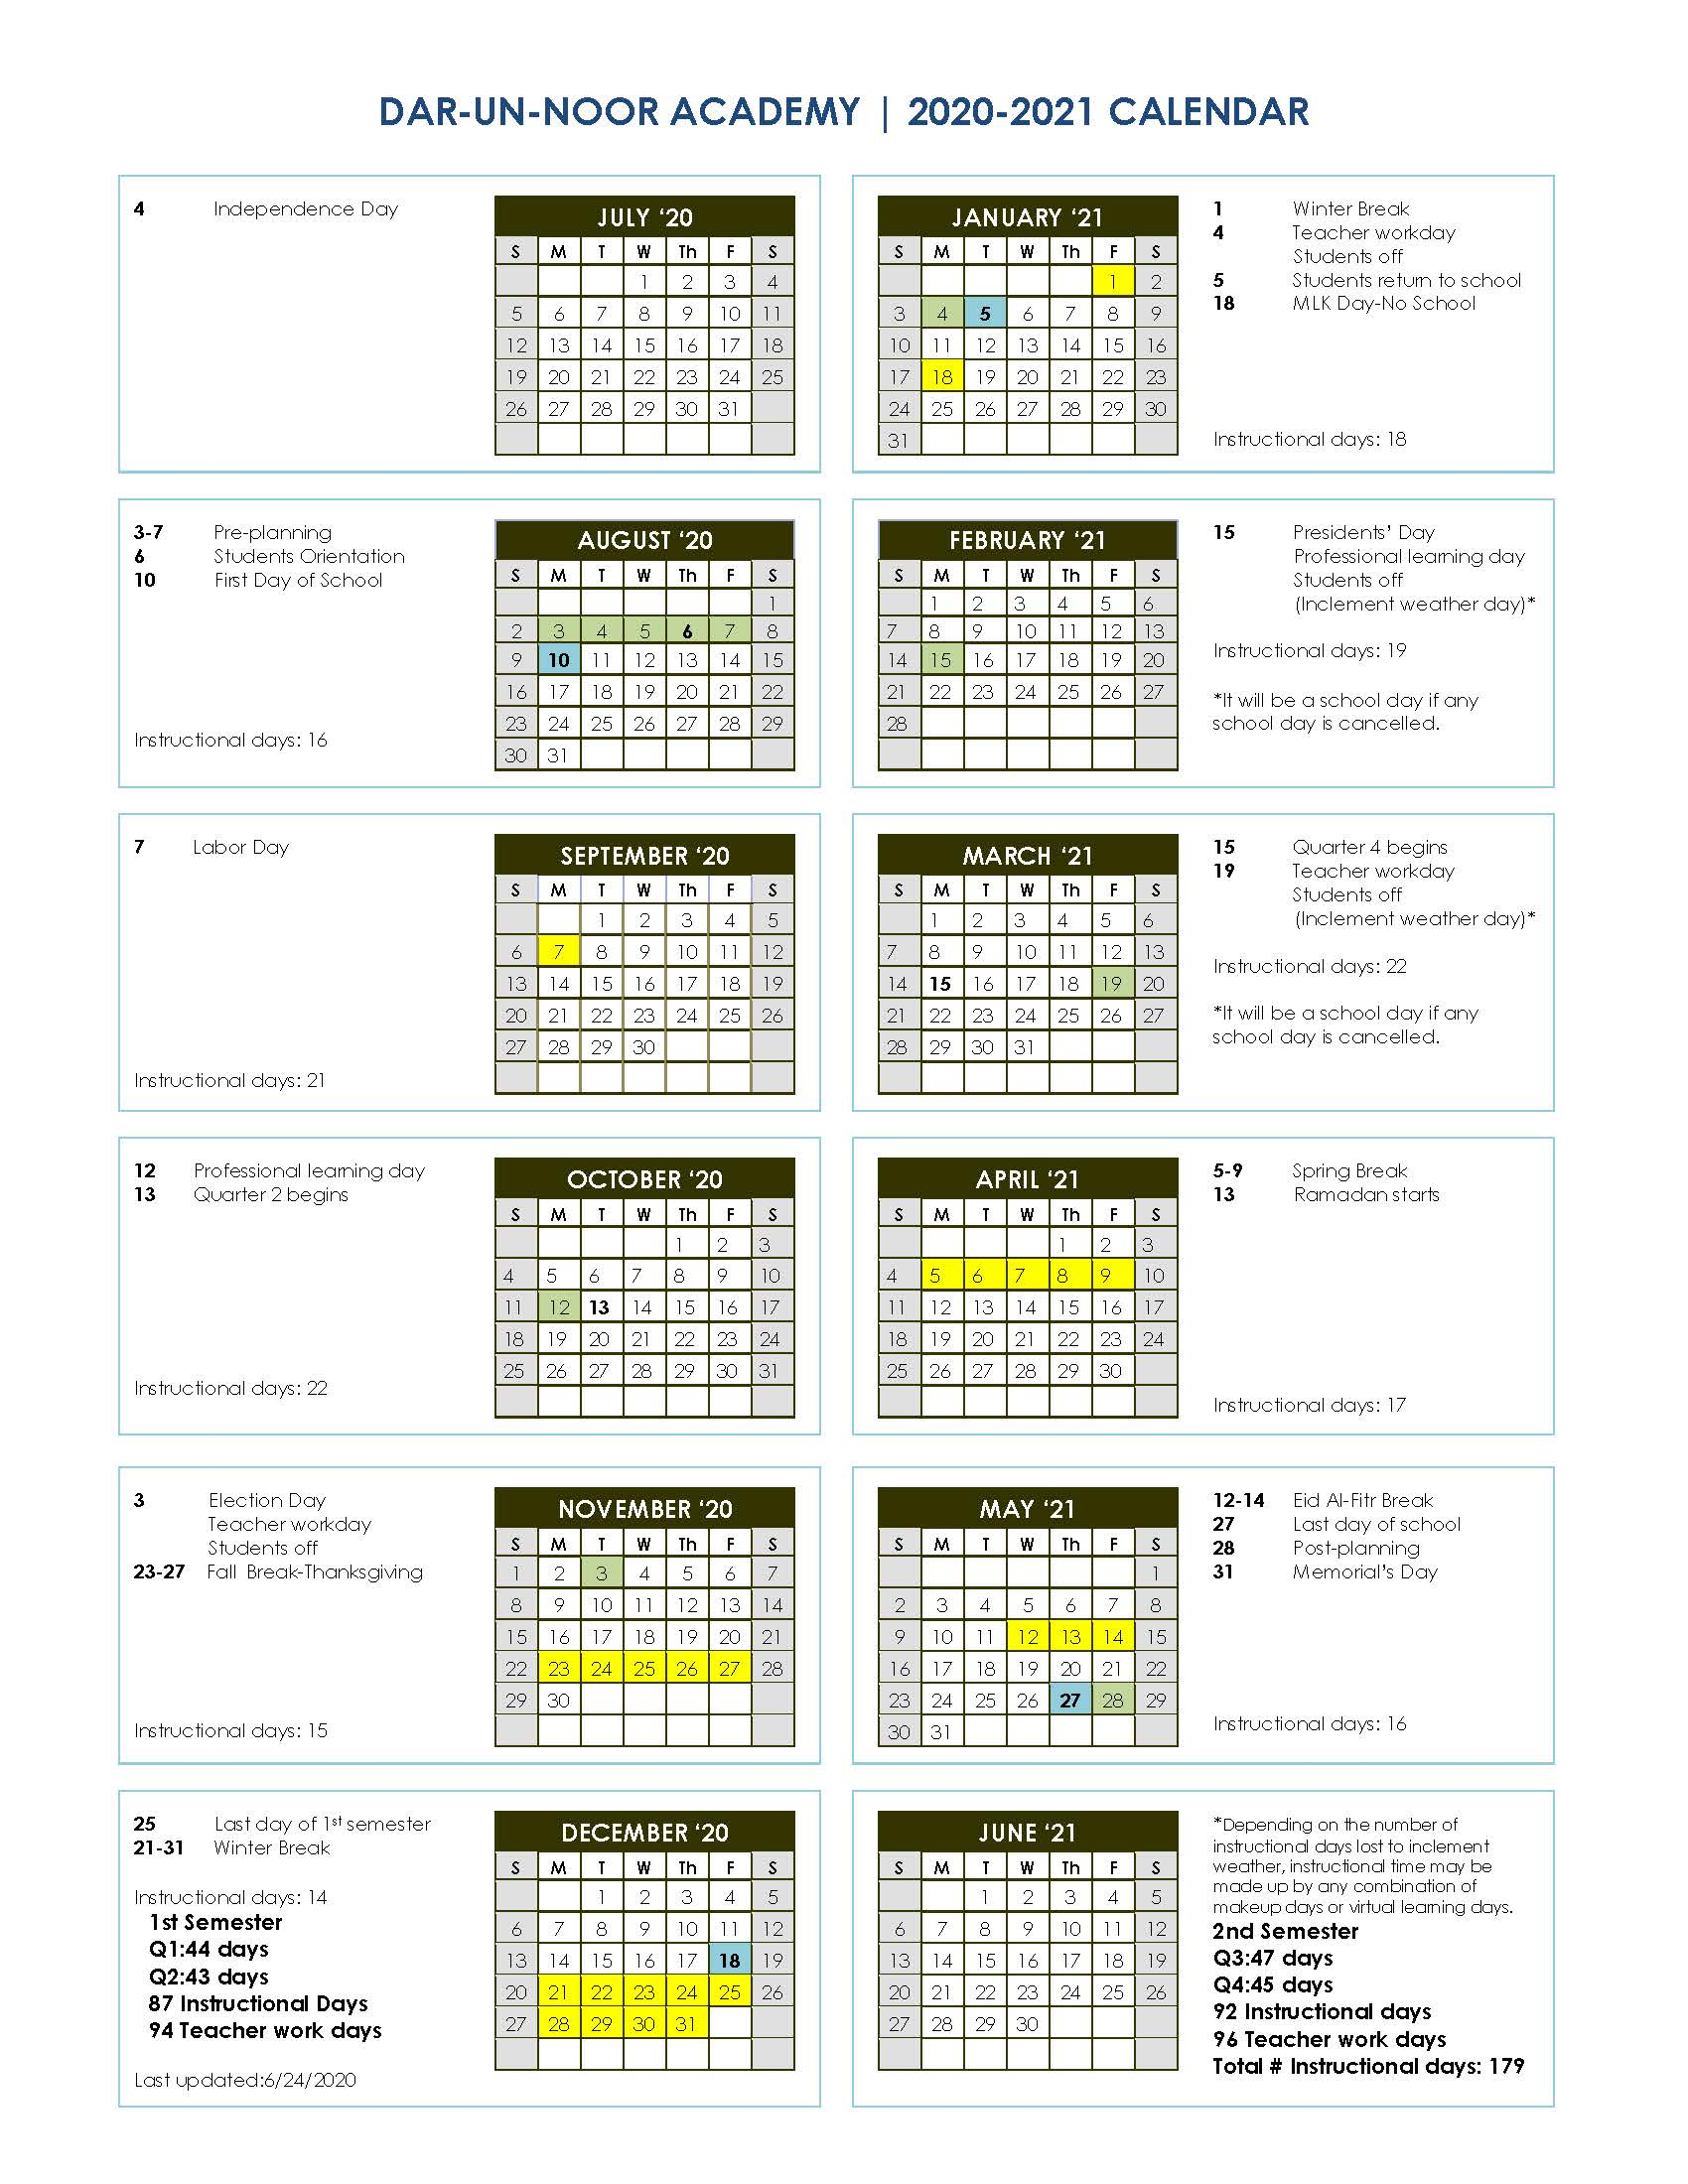 Academic Calendar – Dar un Noor Academy